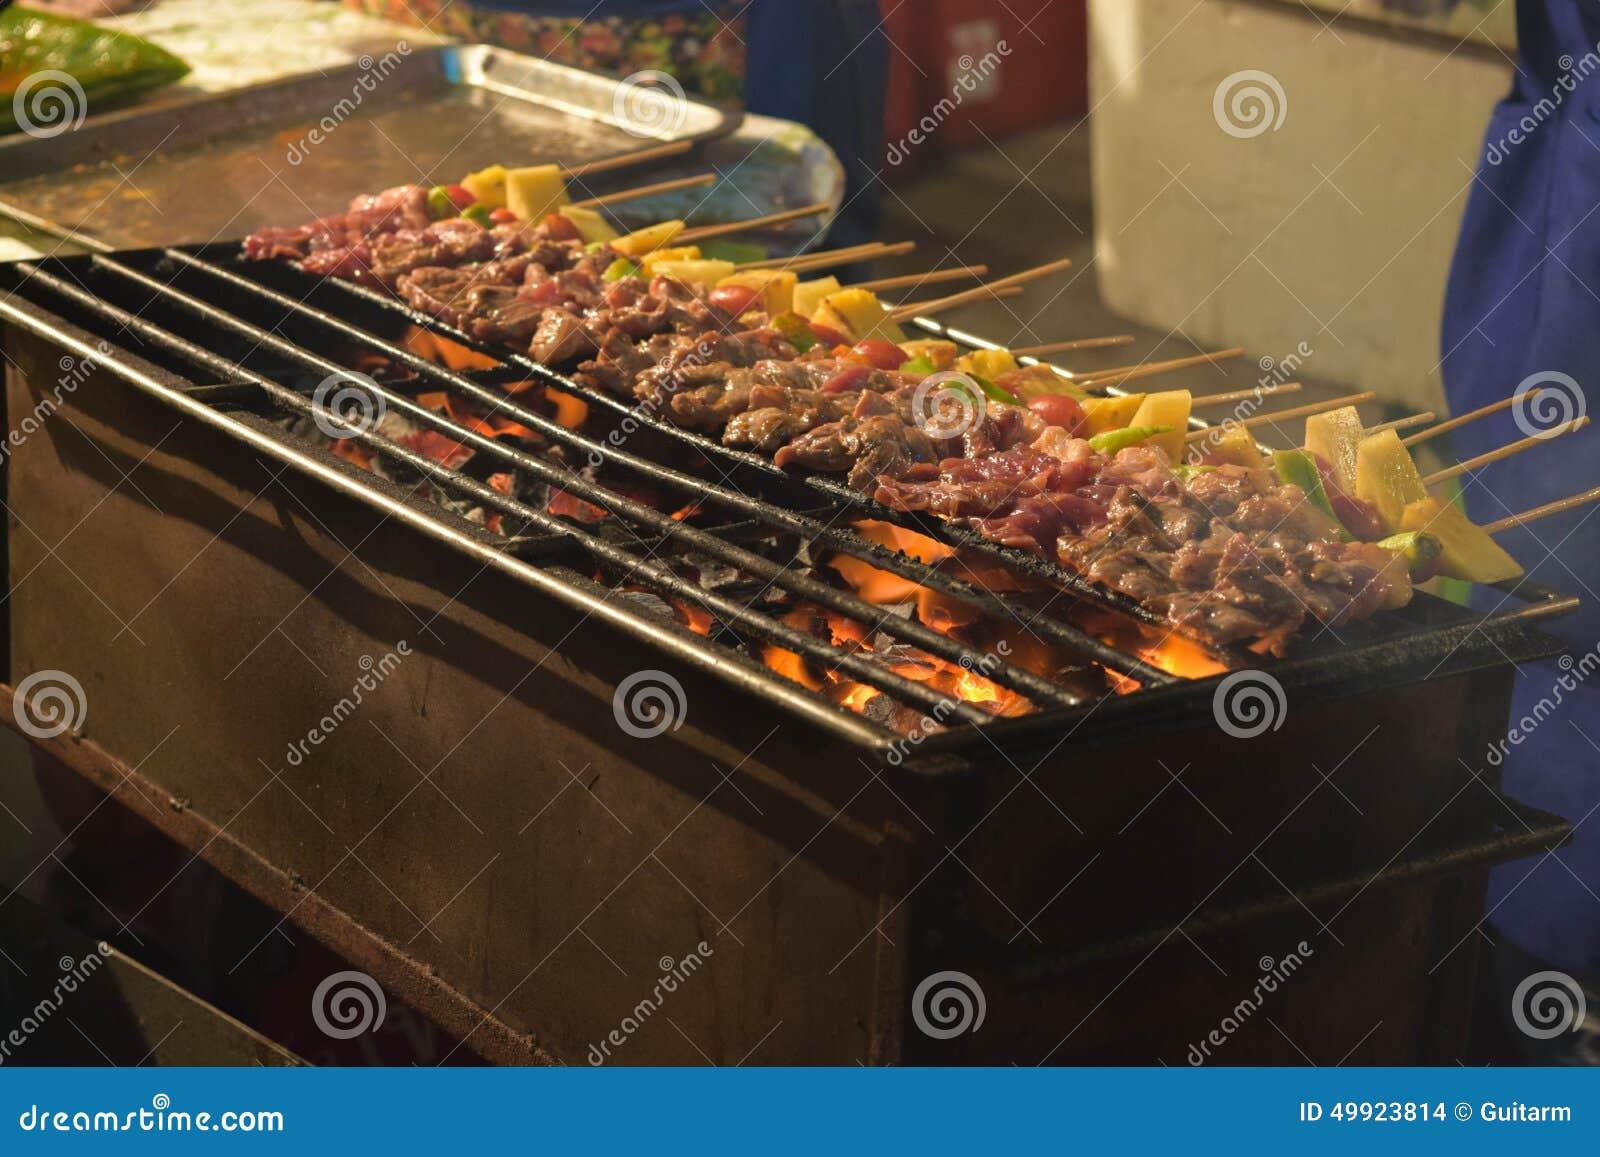 grilling shashlik on barbecue grill selective focus stock. Black Bedroom Furniture Sets. Home Design Ideas